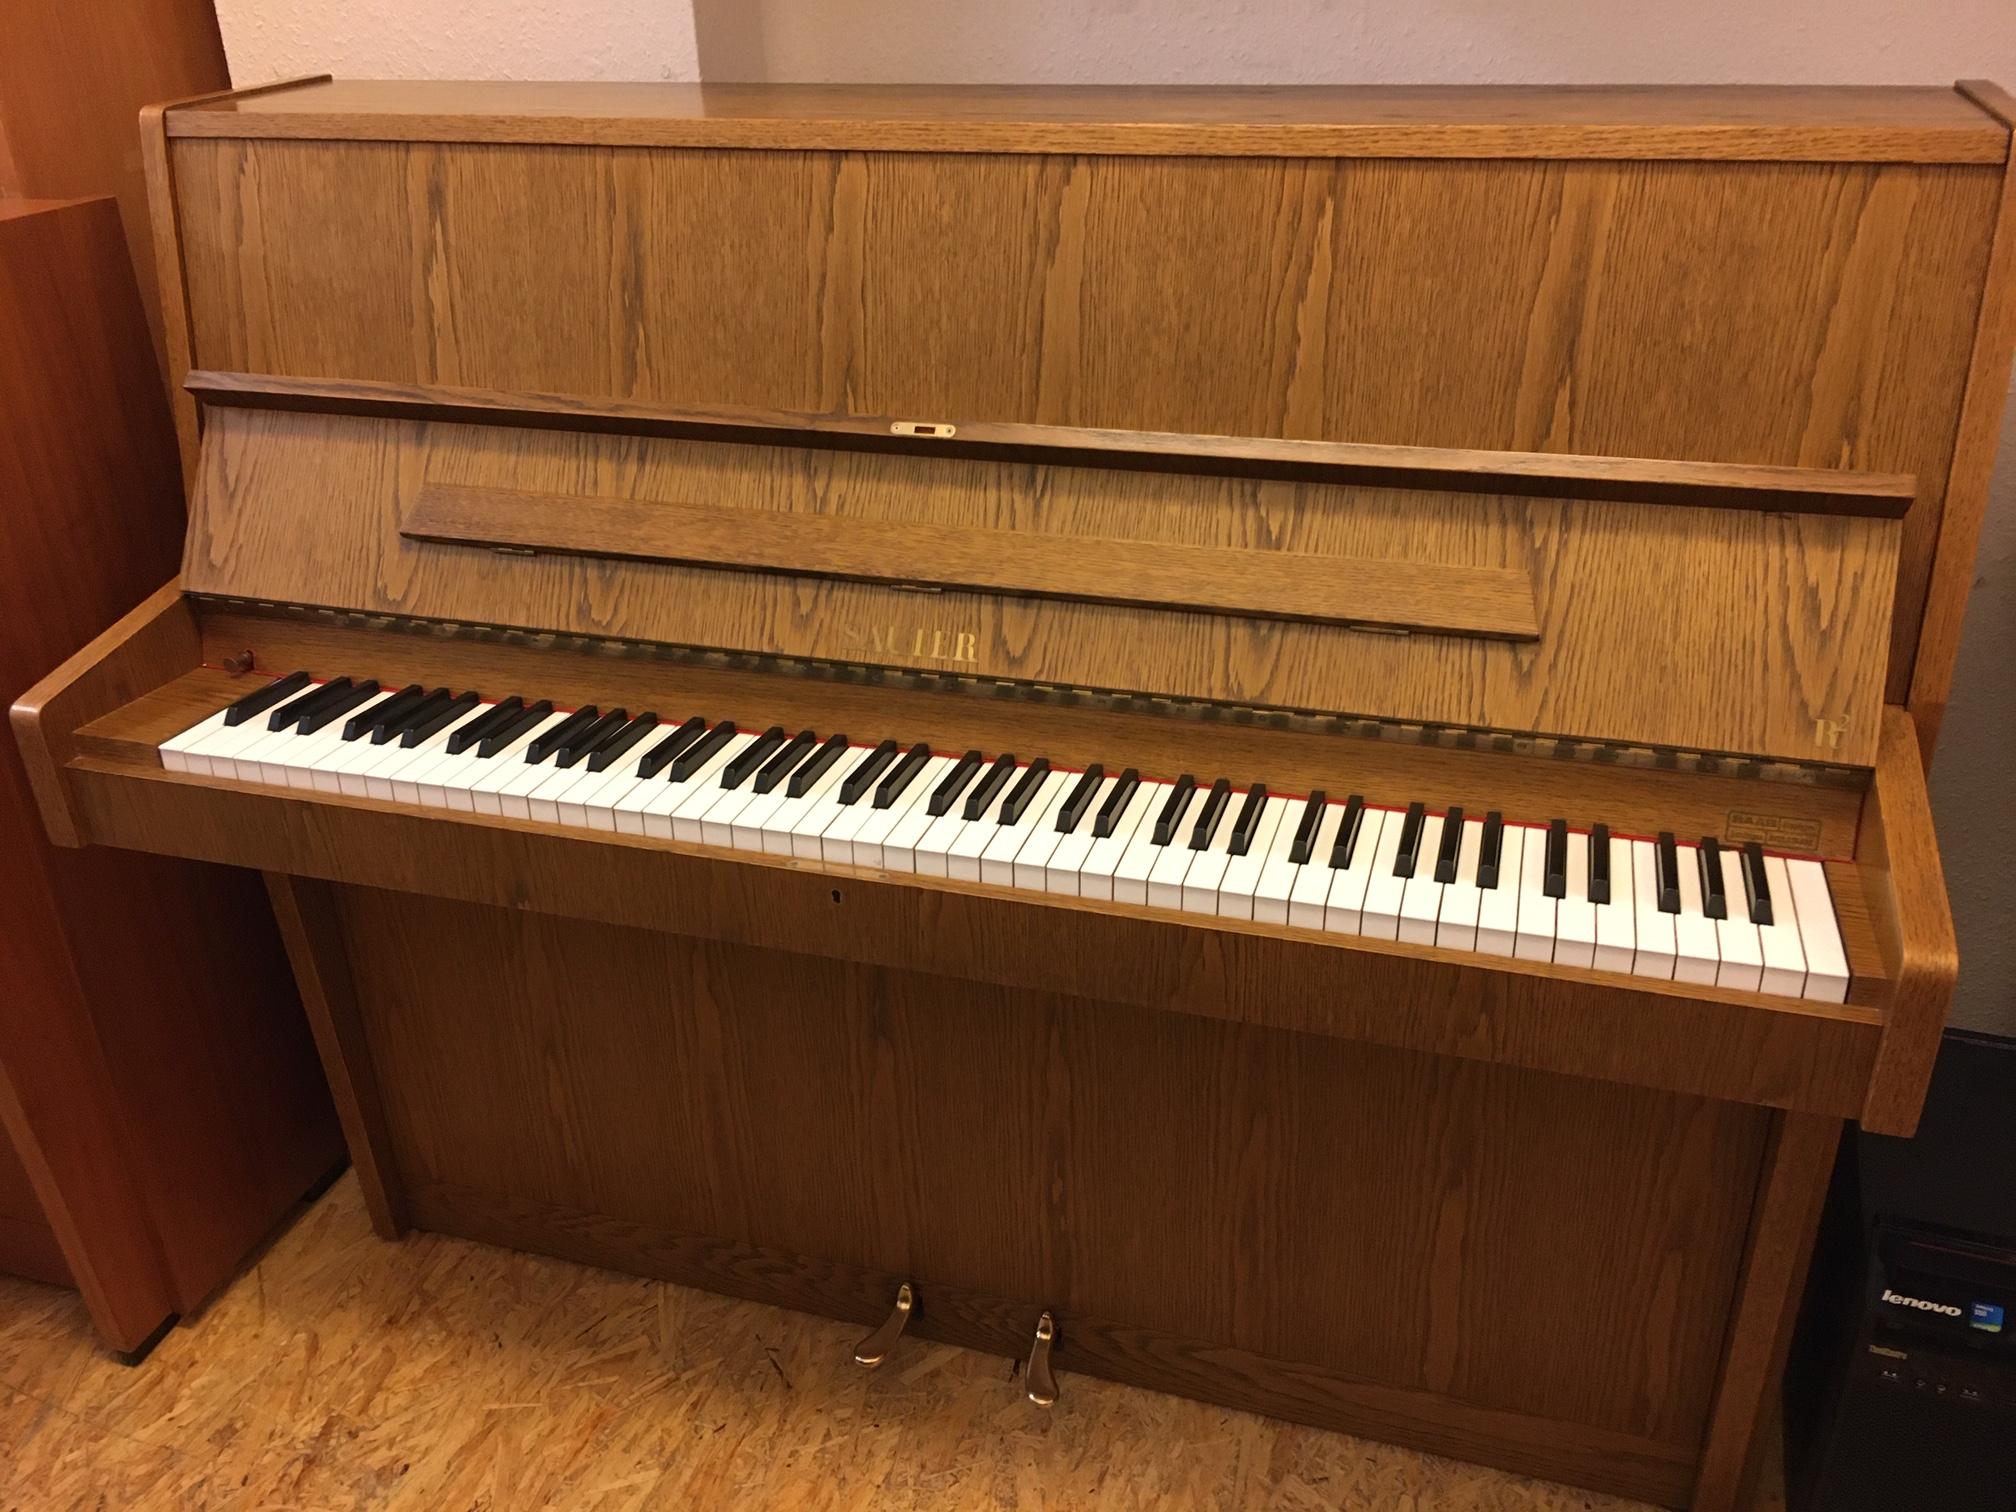 Sauter Klavier Modell 118 Eiche